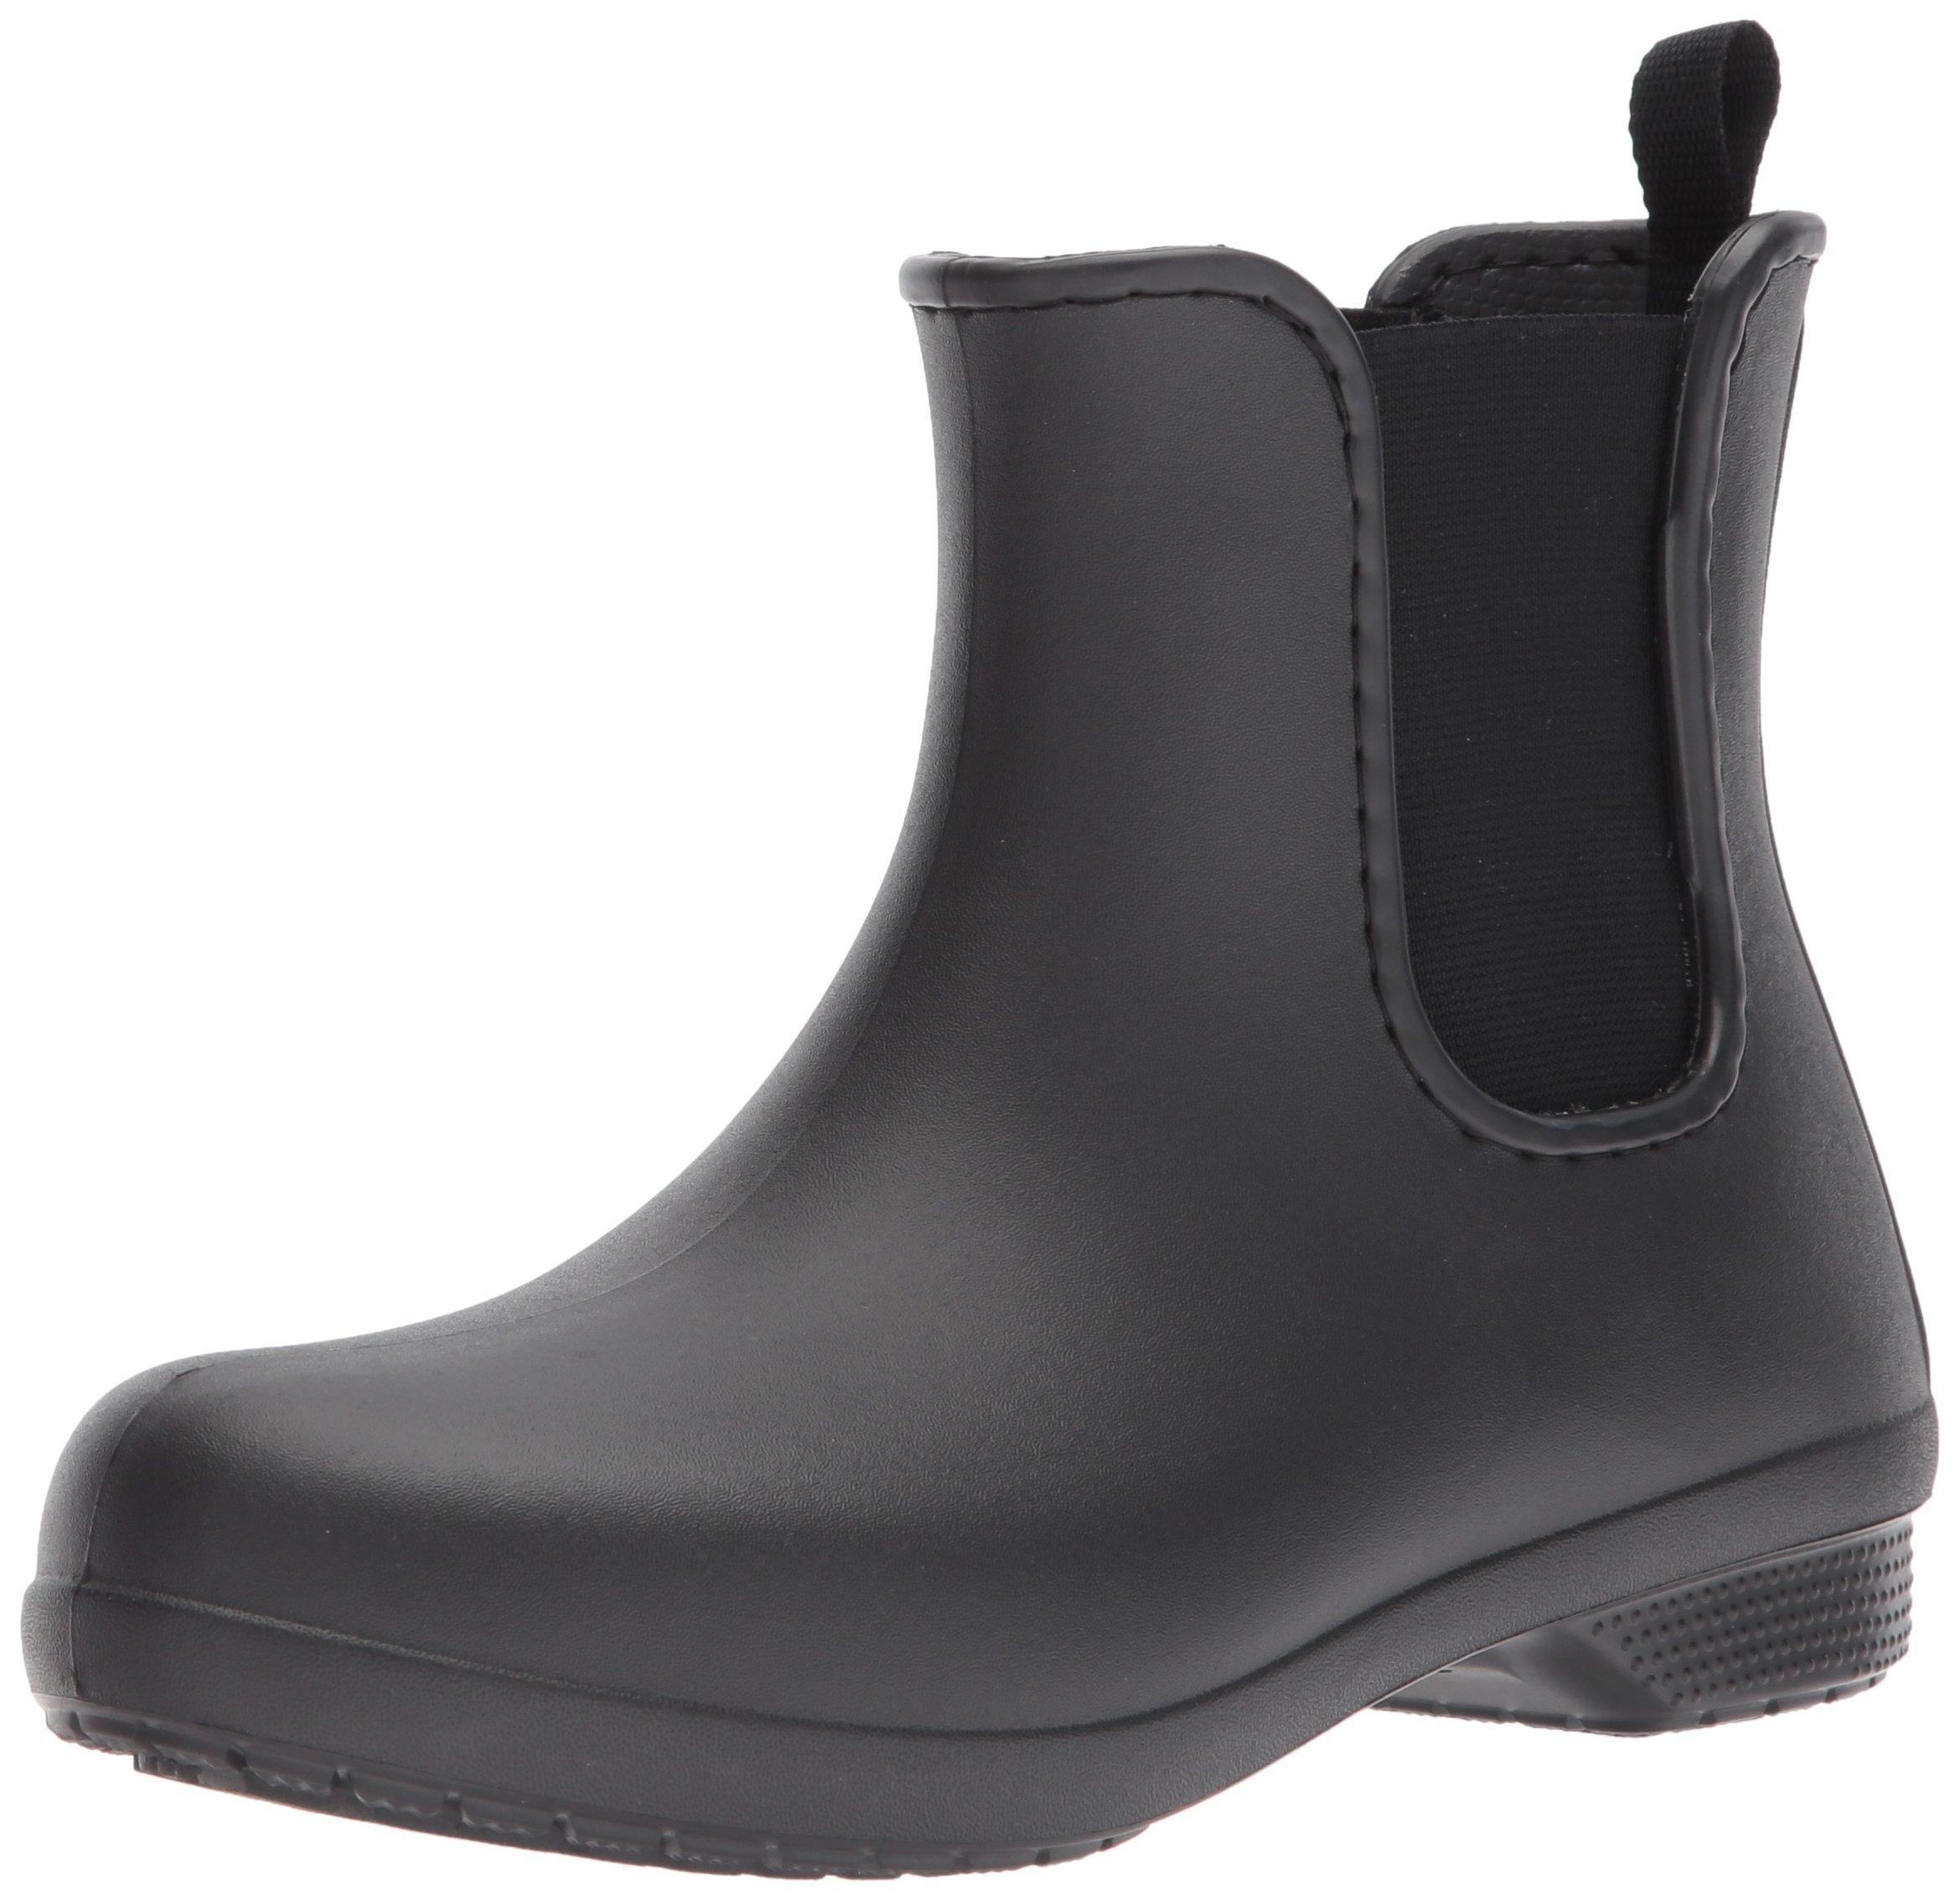 Crocs Women's Freesail Chelsea Rain Boot, Black/Black, 9 M US by Crocs